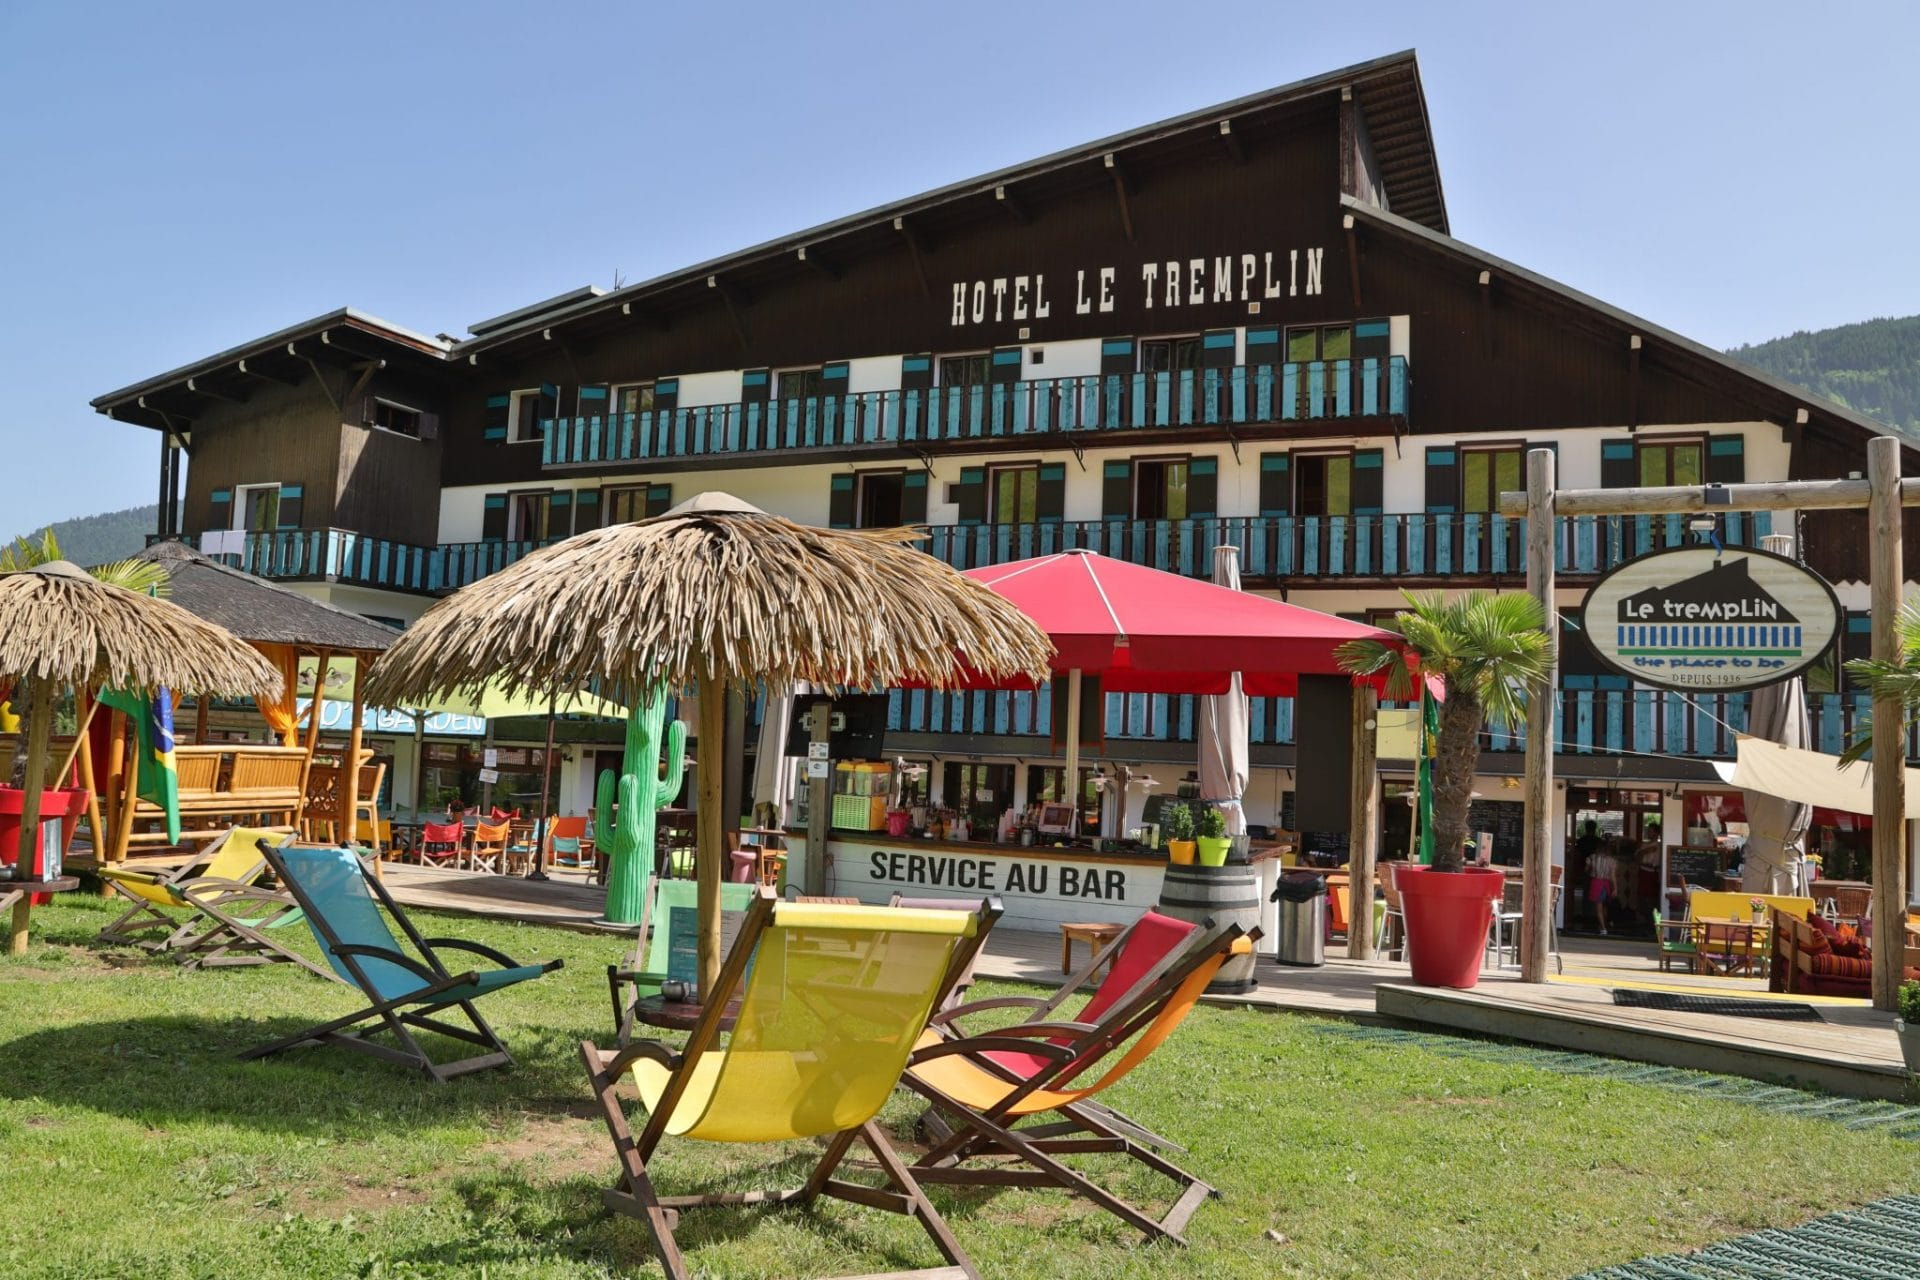 Hotel Tremplin Morzine ete terrasse relax chill